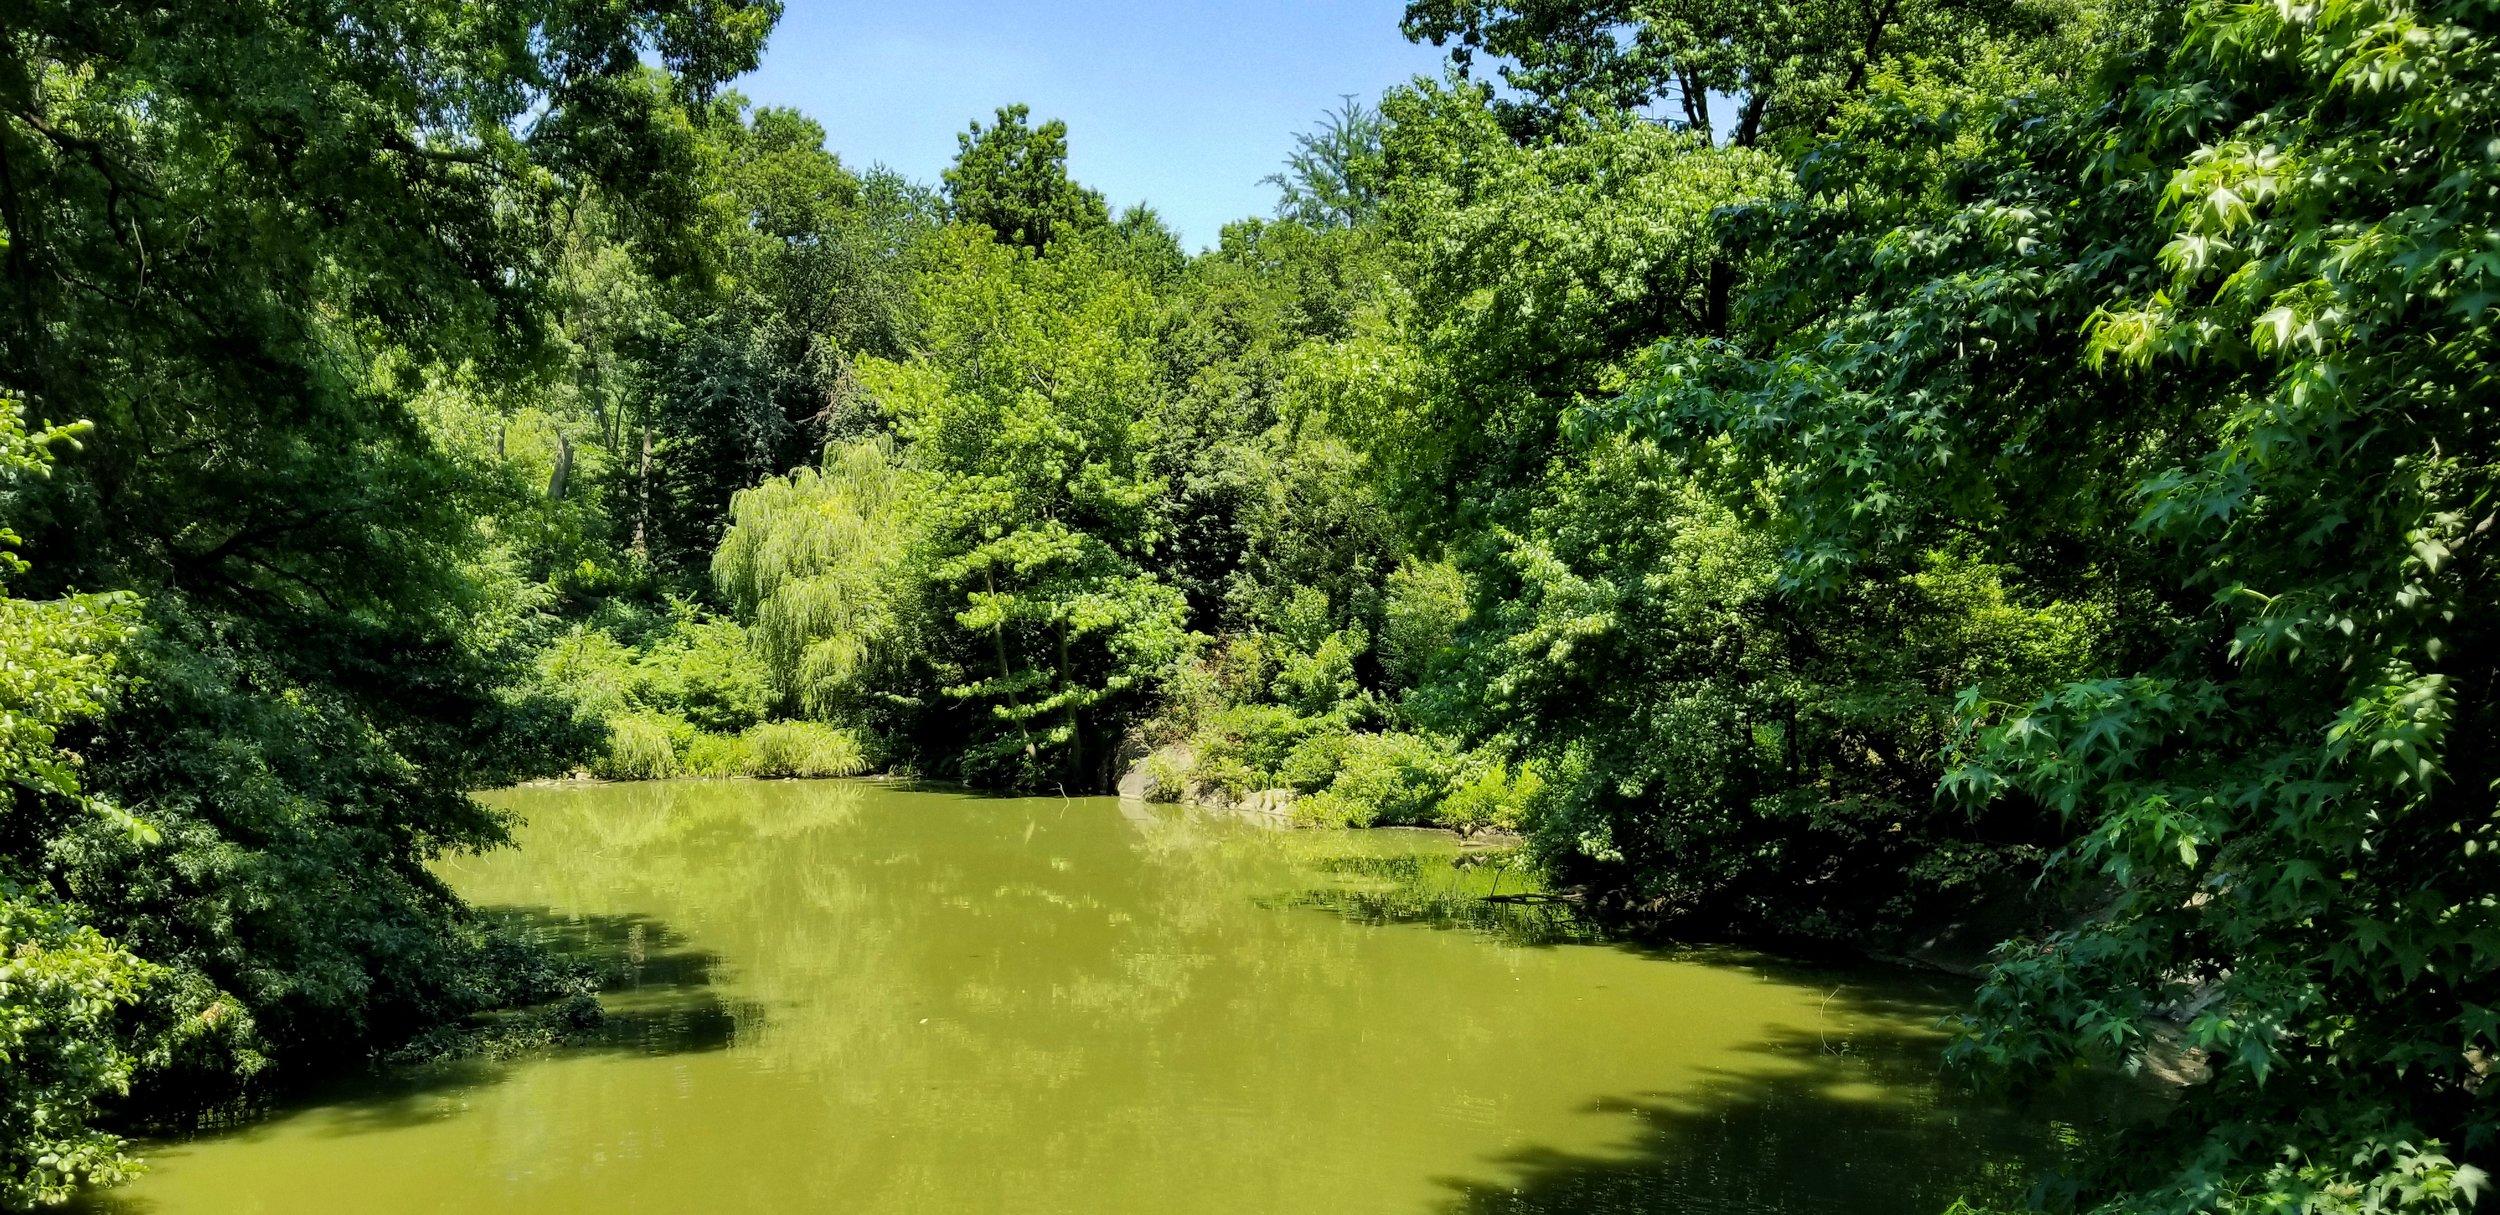 Bank Rock Bay | Central Park, New York, New York